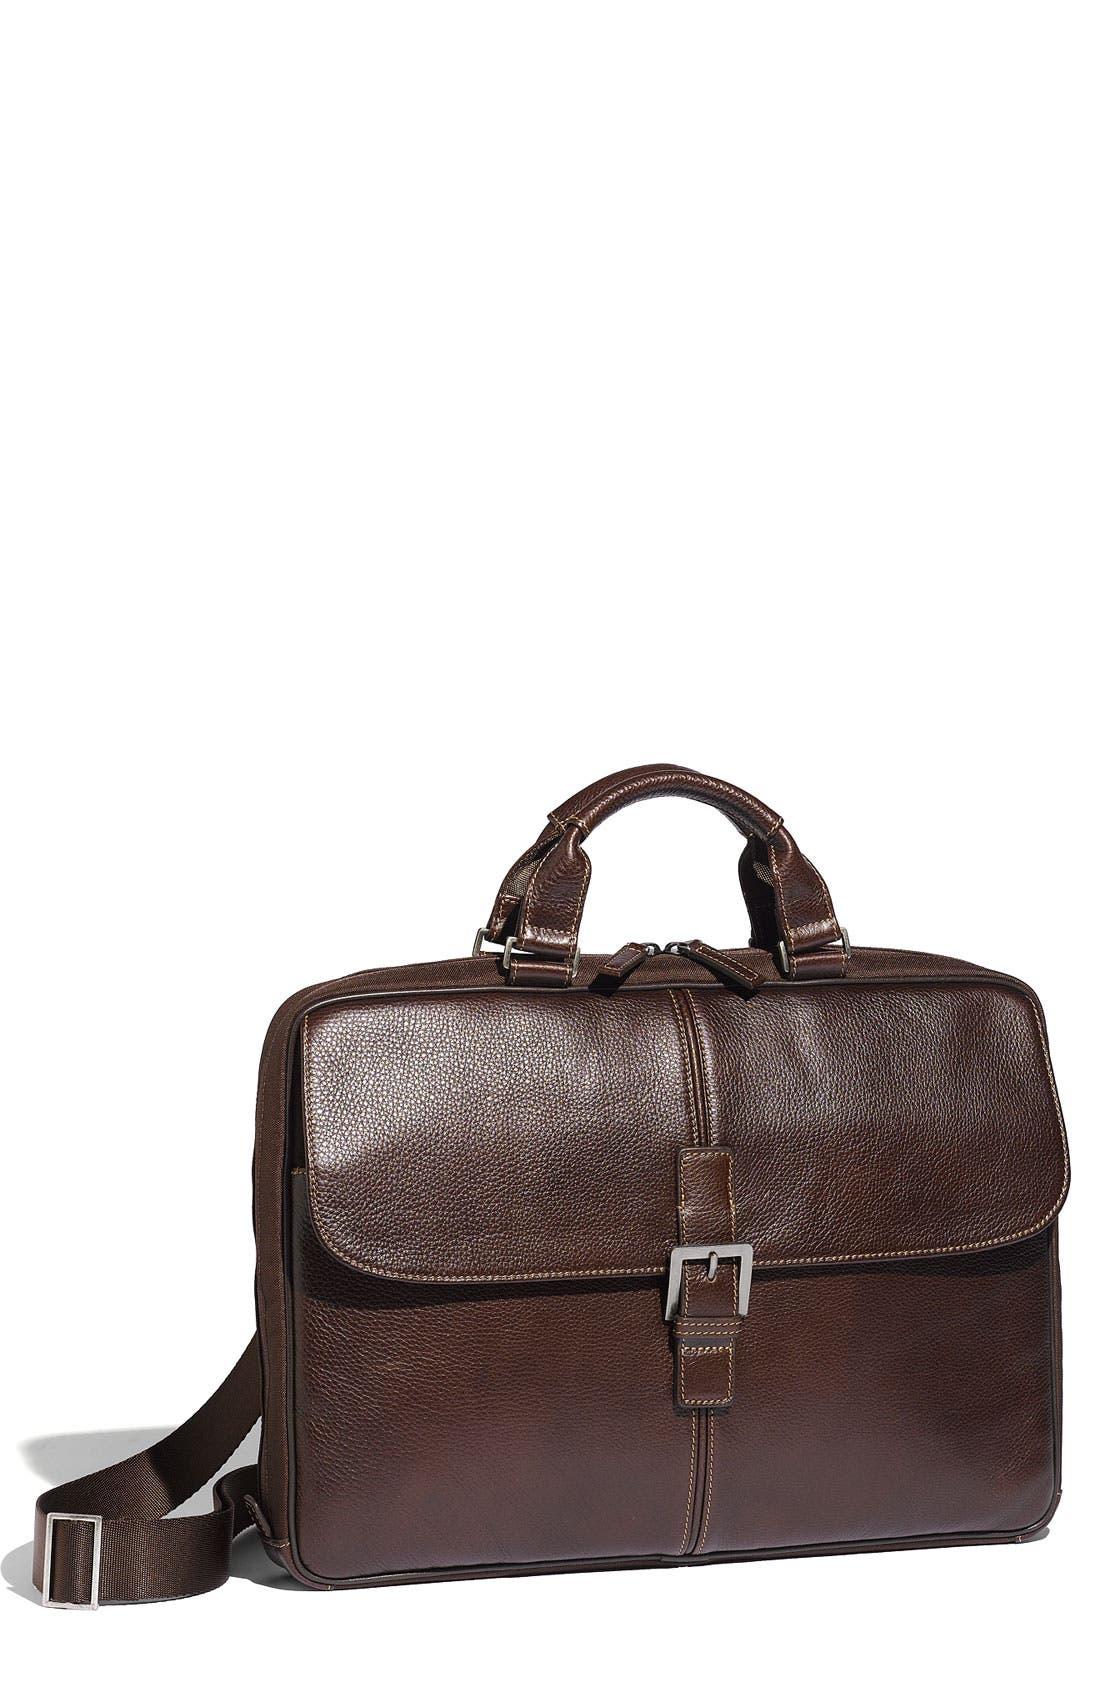 Alternate Image 1 Selected - Boconi 'Tyler' Tumbled Leather Portfolio Briefcase